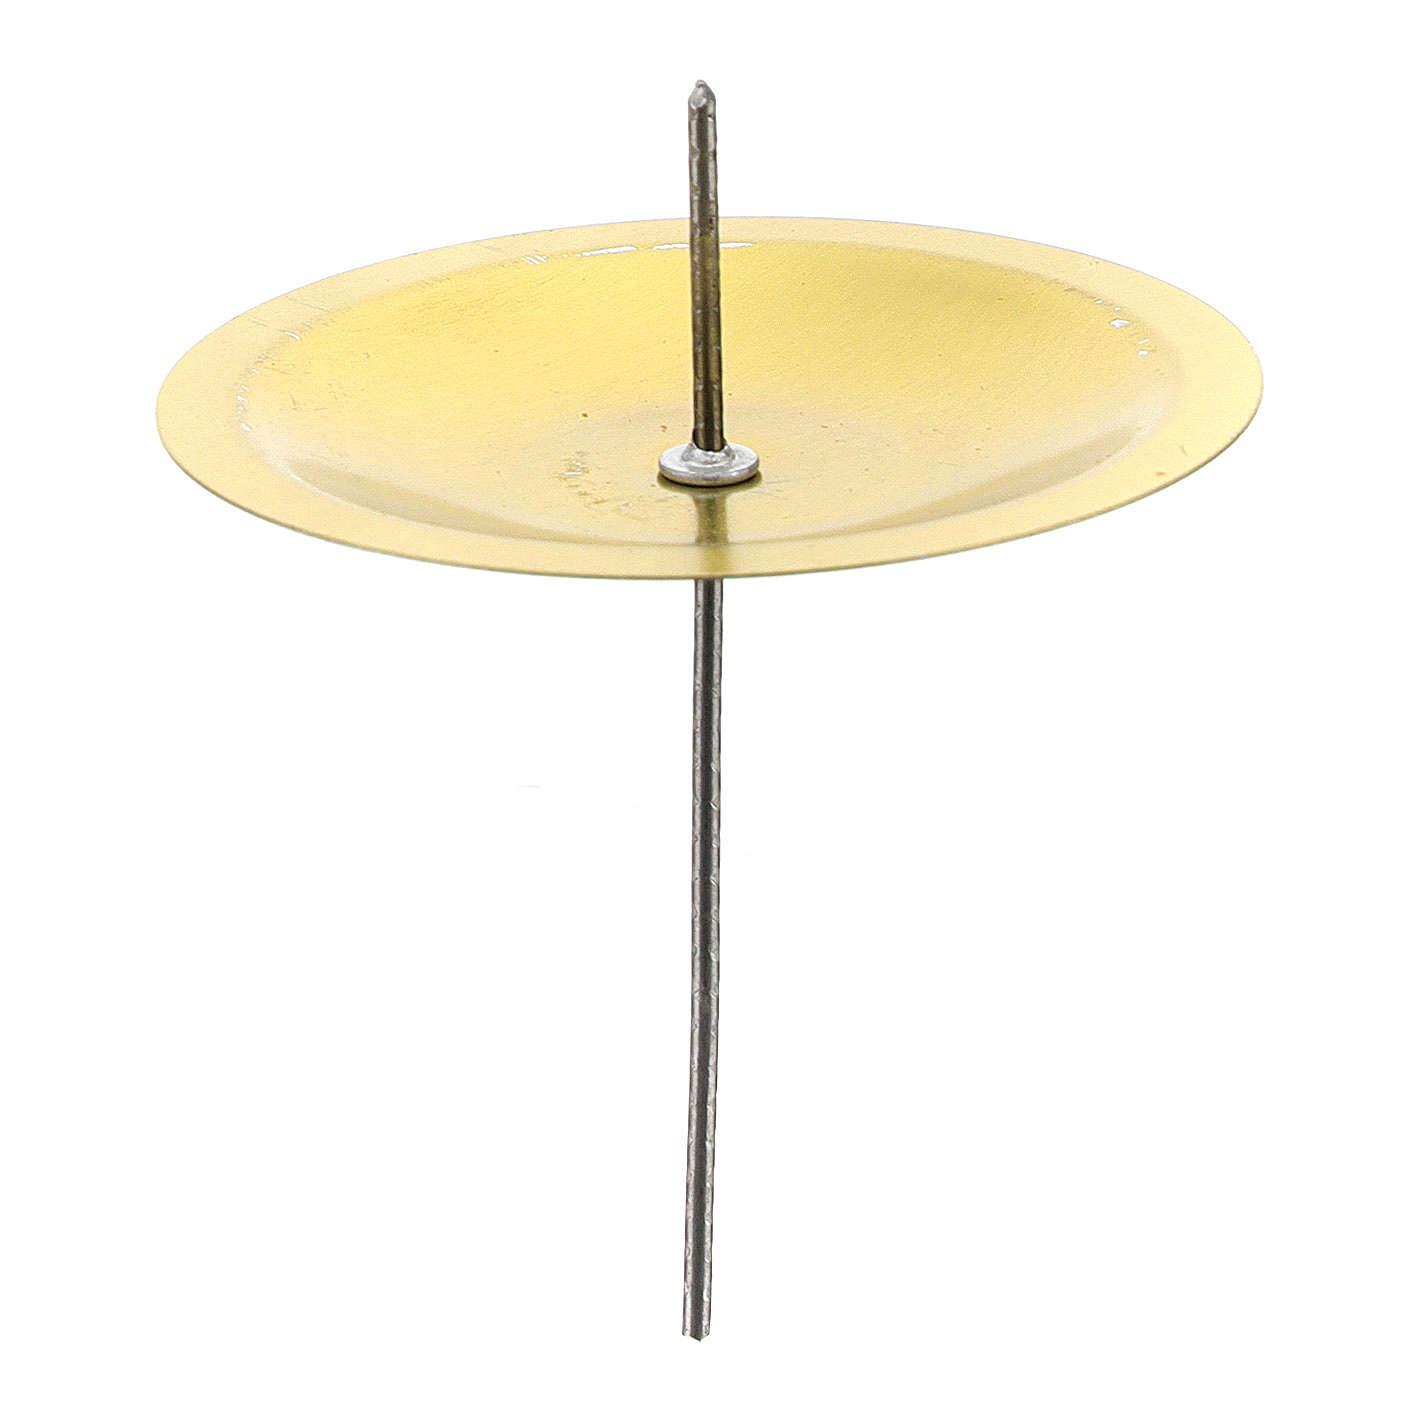 Portacandele per Avvento 4 pz ottone dorato diam. 5 cm 3